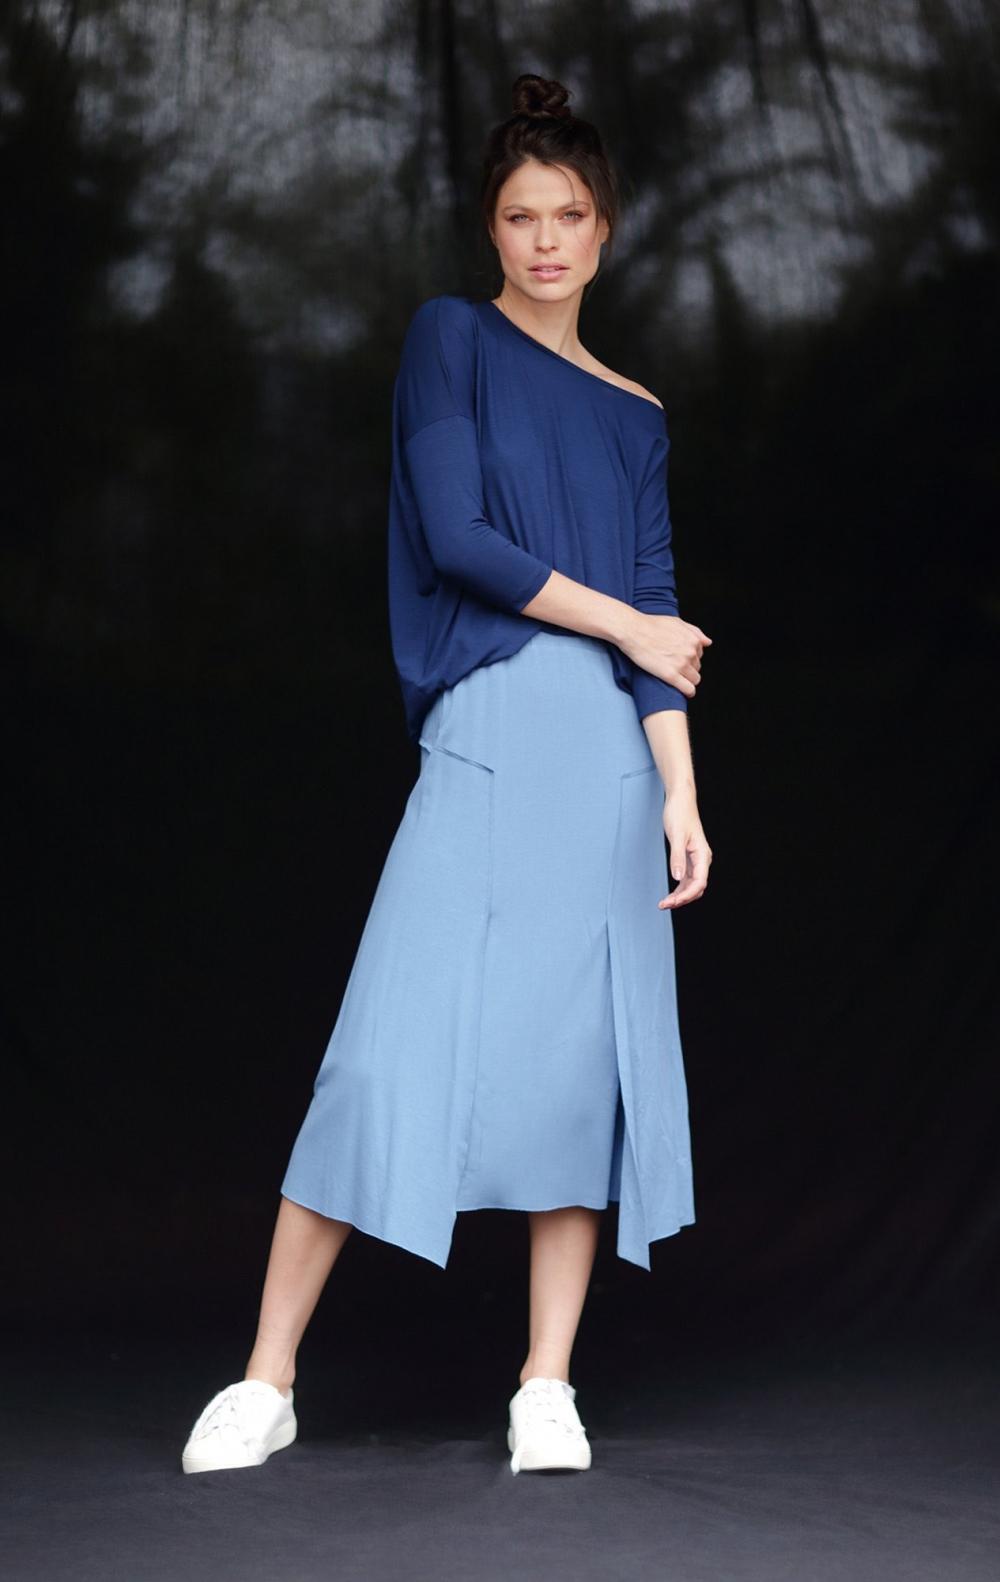 Blusa Malha Sophia Azul  - Foto 1